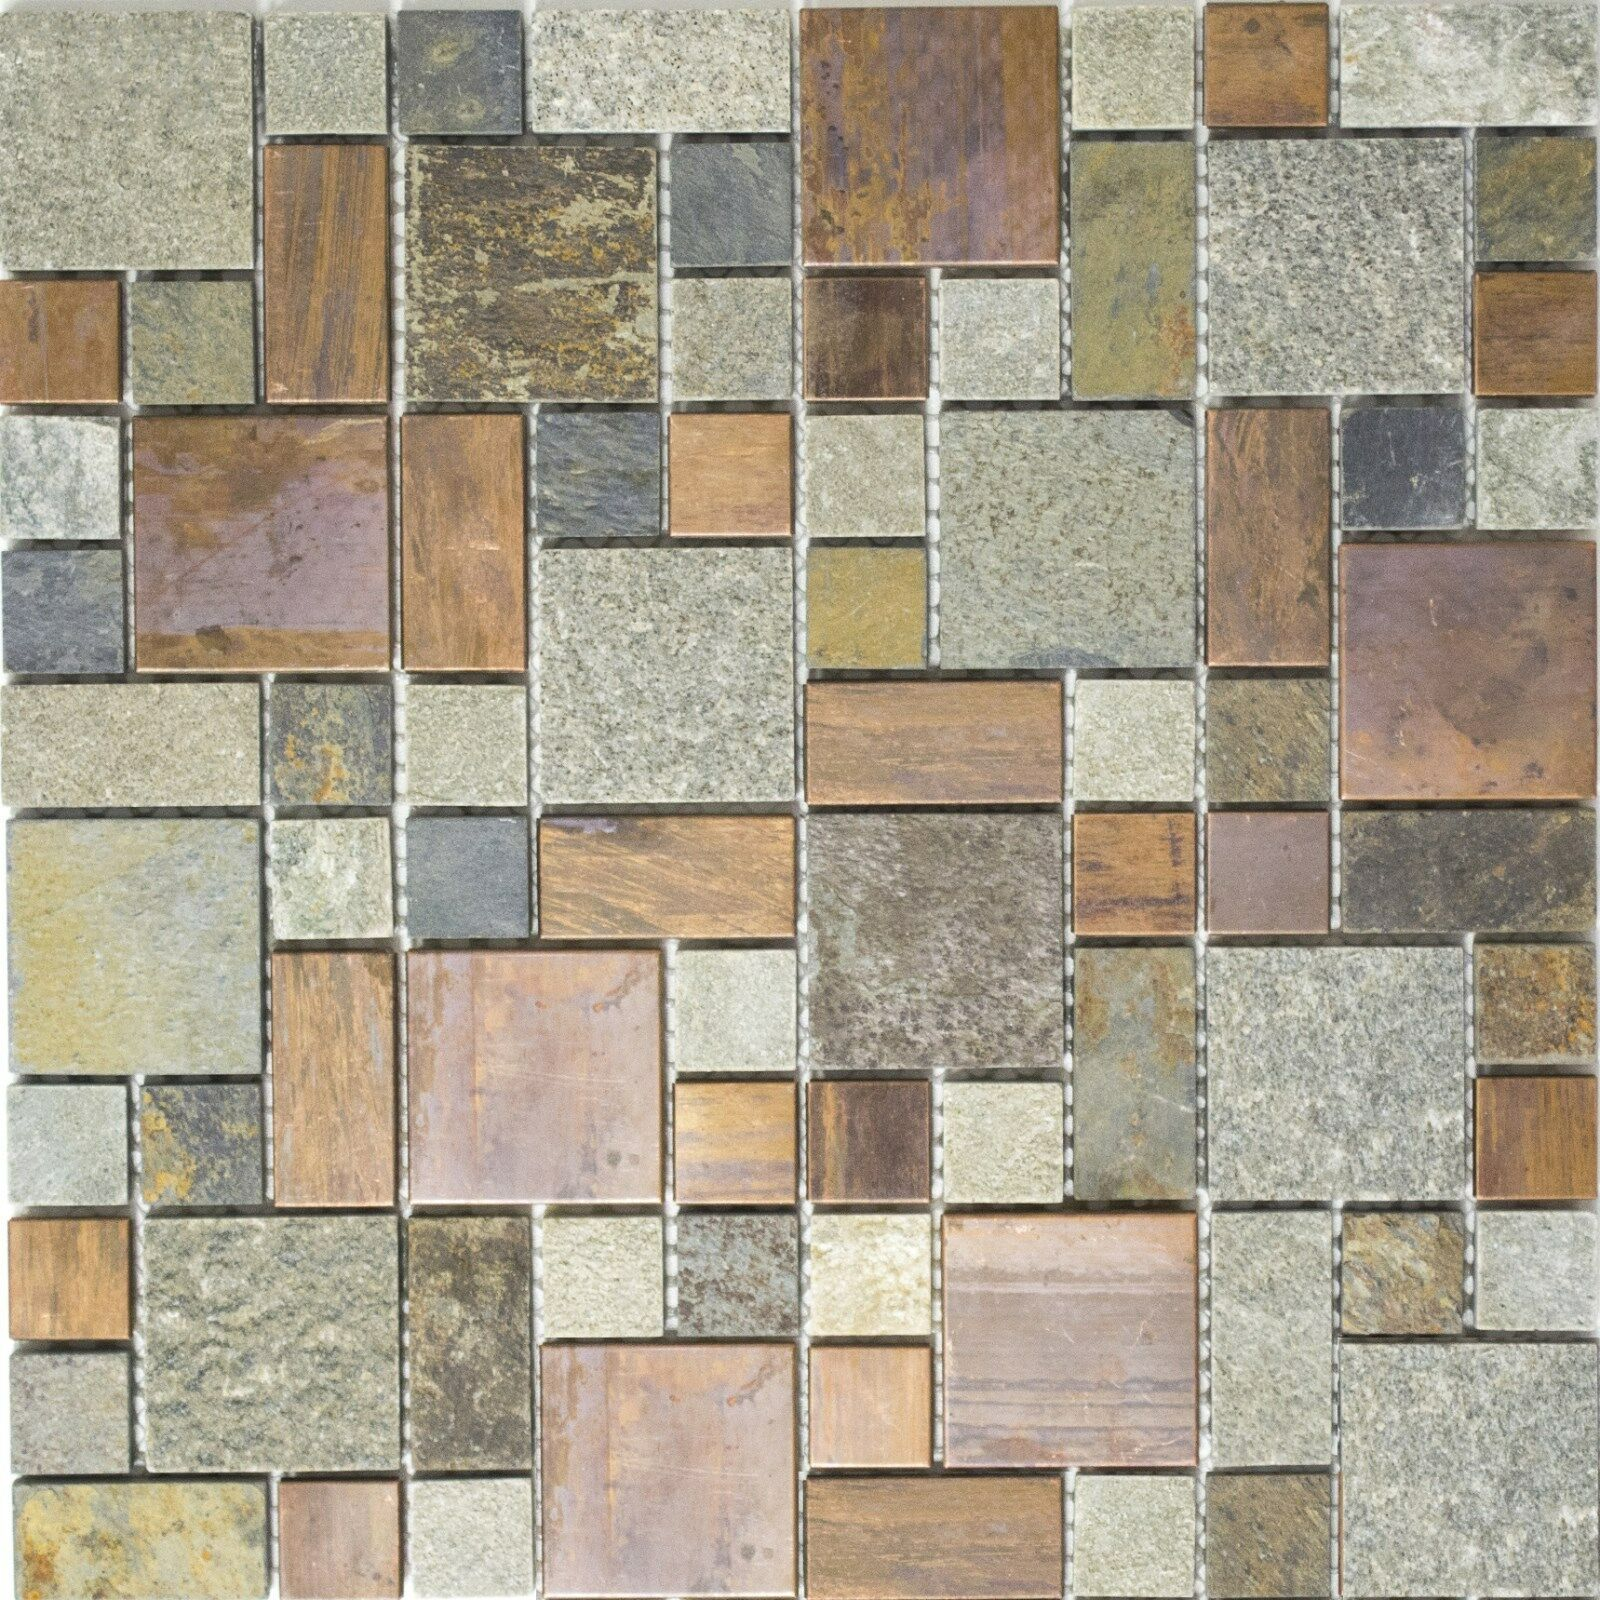 Mosaik Fliese Kupfer grau rost kupfer Kombination Stein Küche 47-595_f 10 Matten